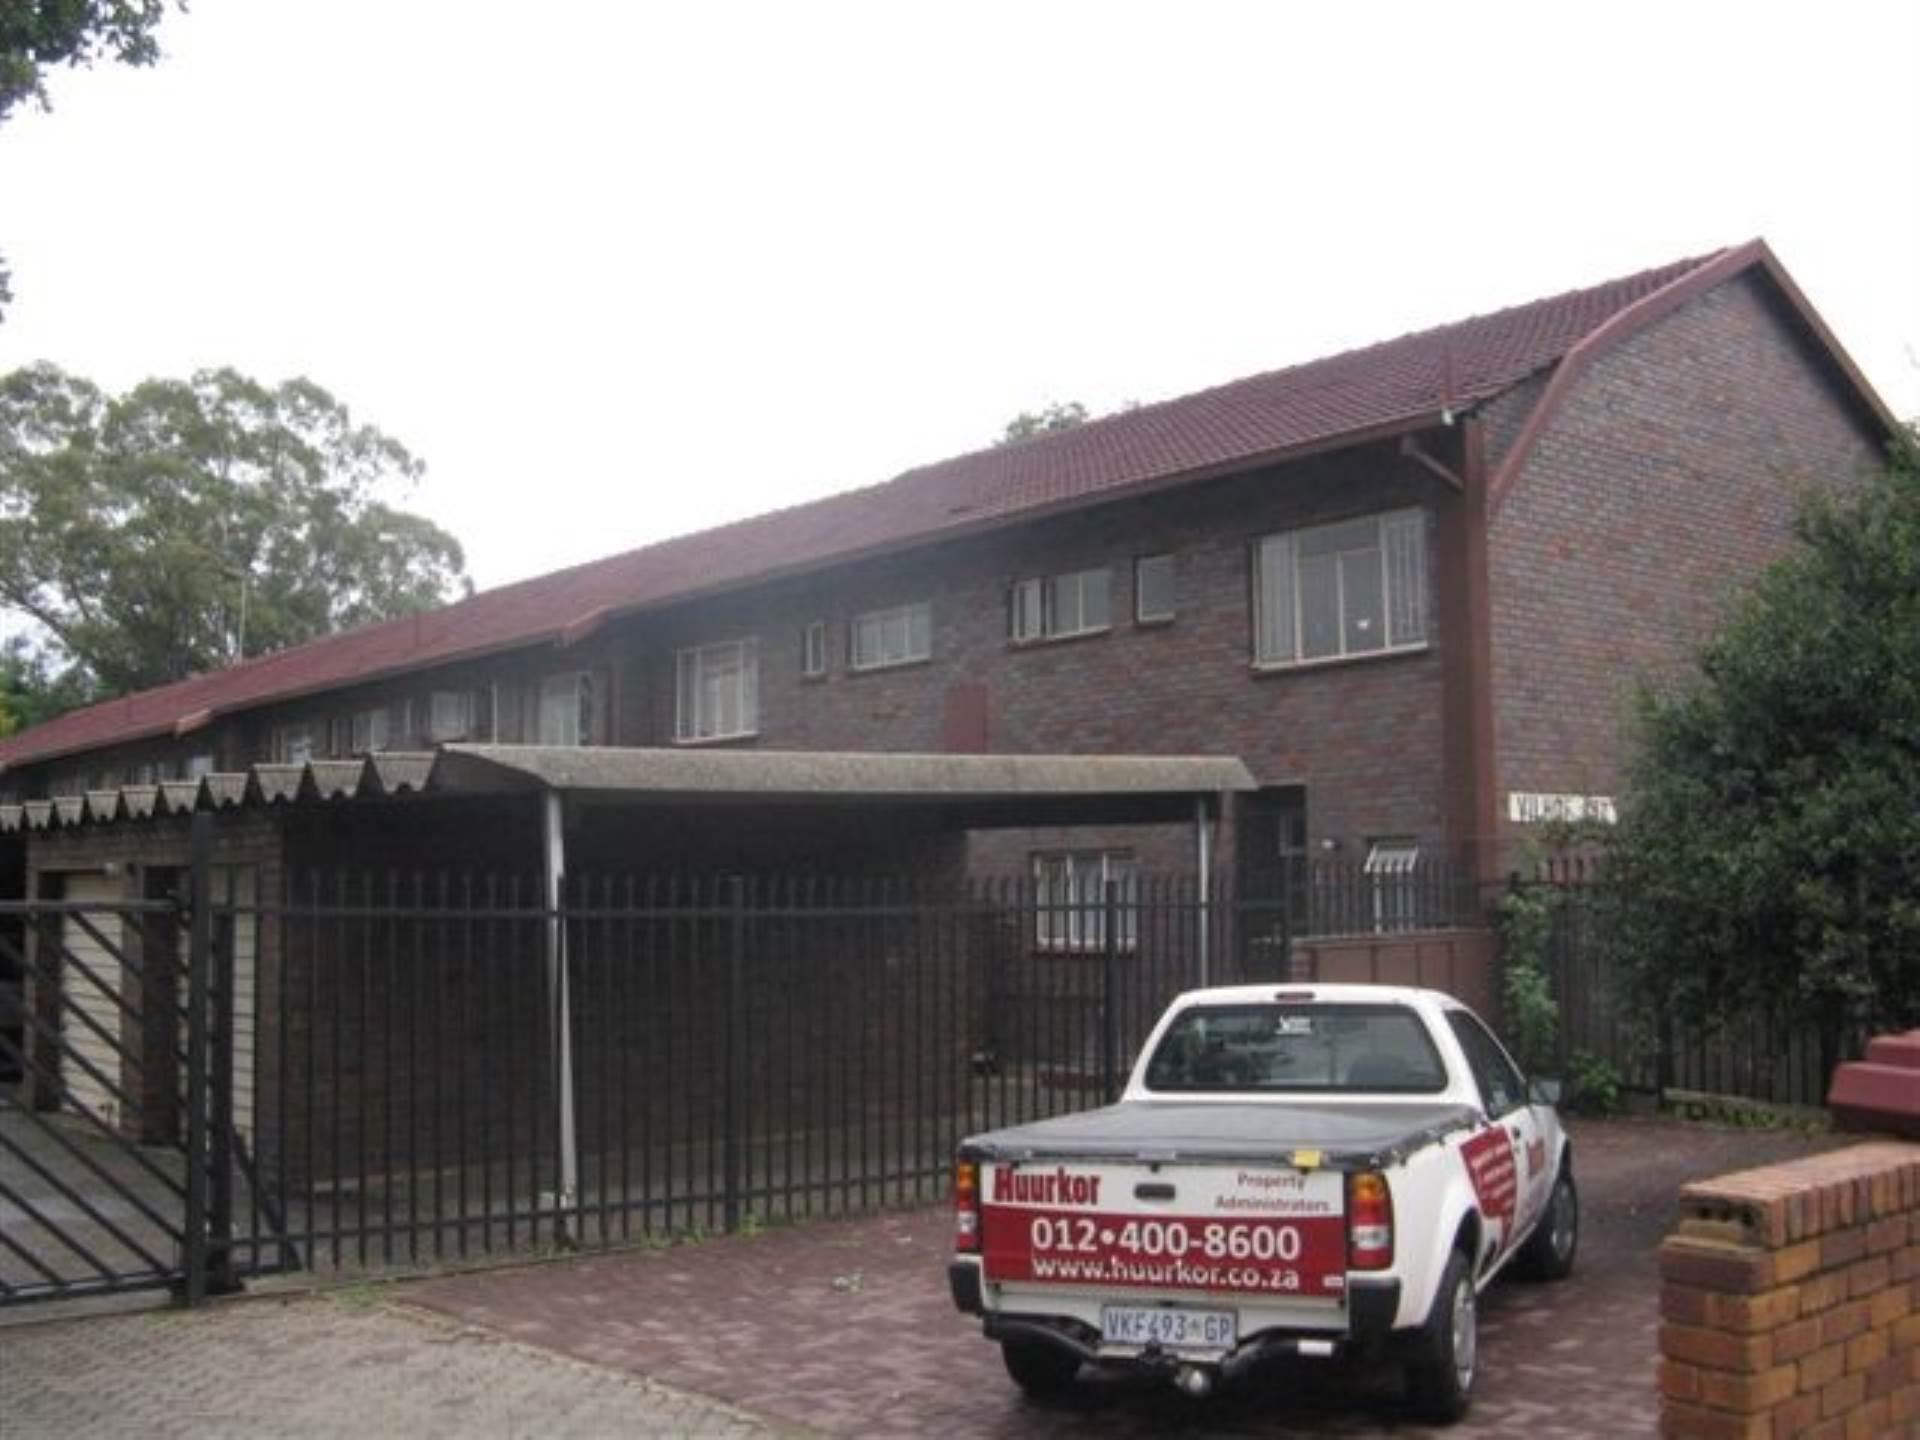 3 BedroomApartment To Rent In Wonderboom South